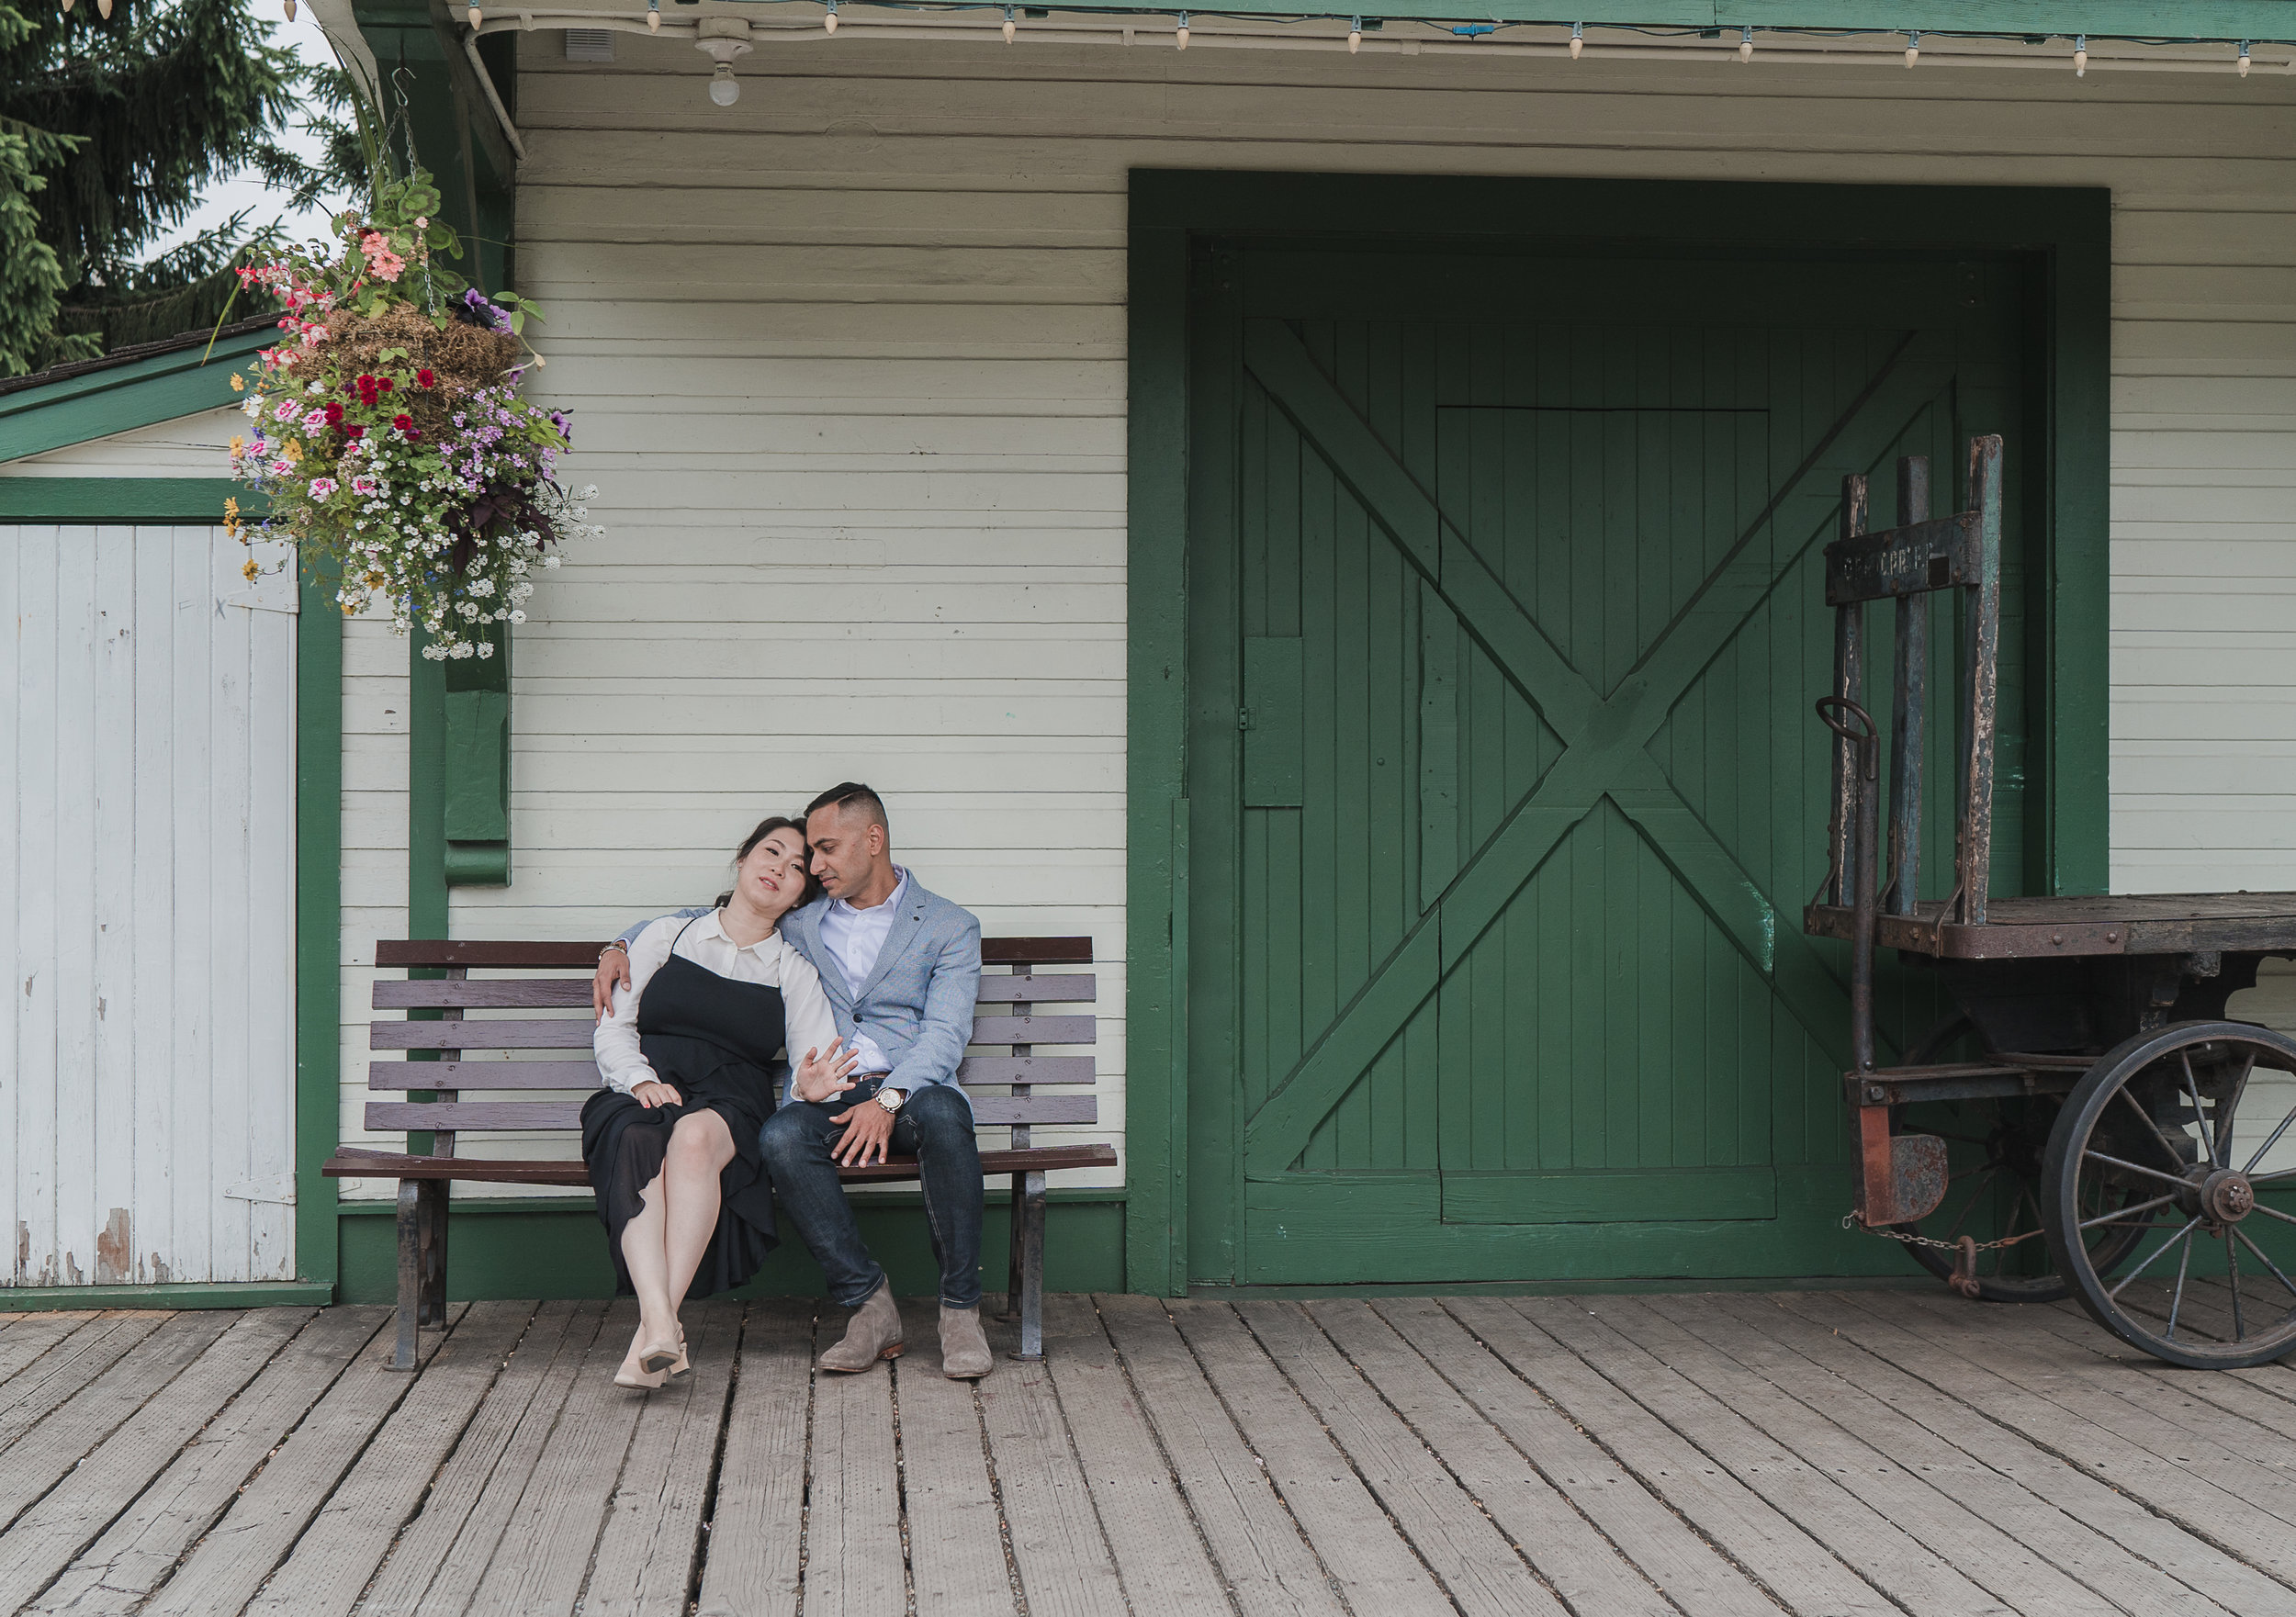 20190622 - Monika & Johnson Engagement- 0072.jpg